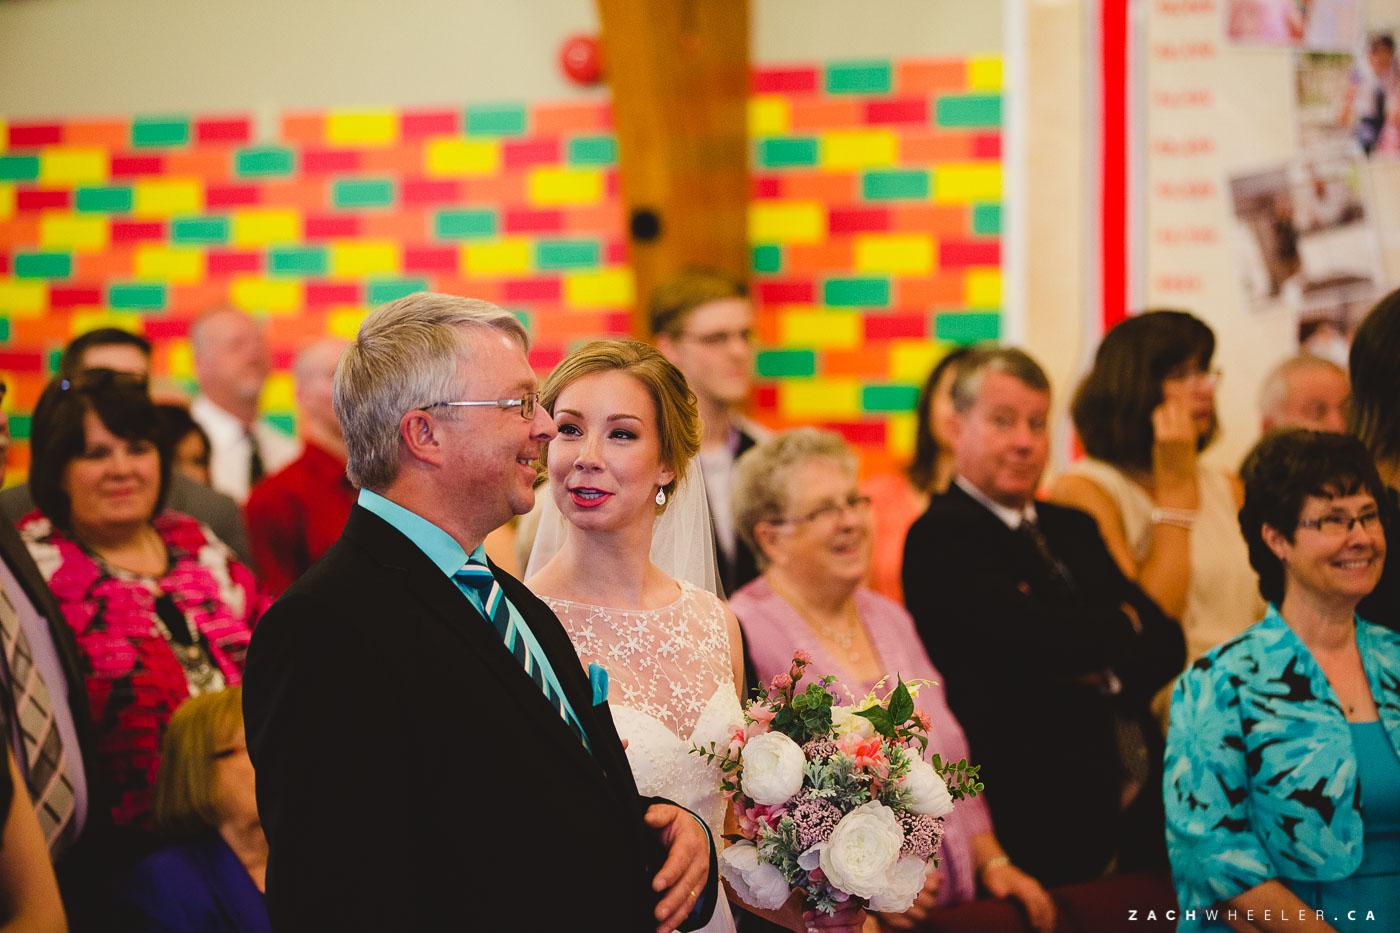 Sarah-Grant-Lesters-Fram-Wedding-31